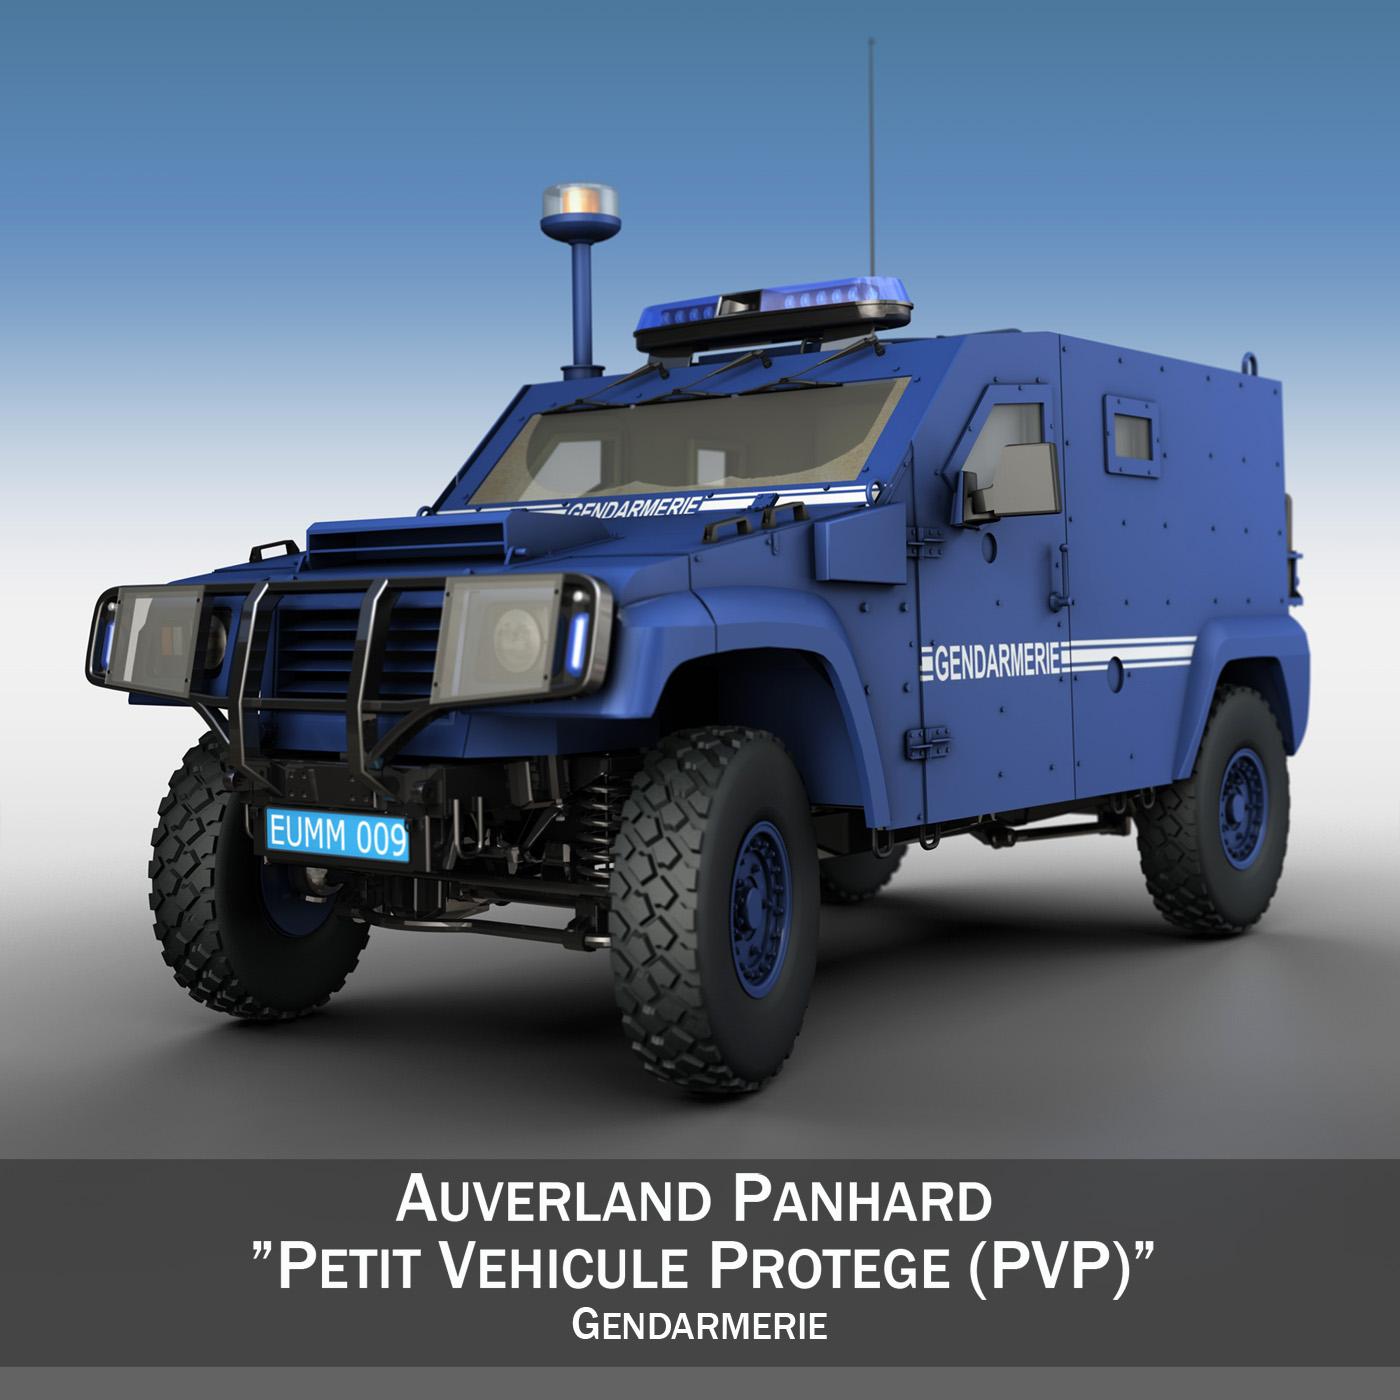 panverland panhard pvp - gendarmerie múnla 3d 3ds fbx c4d lwo obj 190066